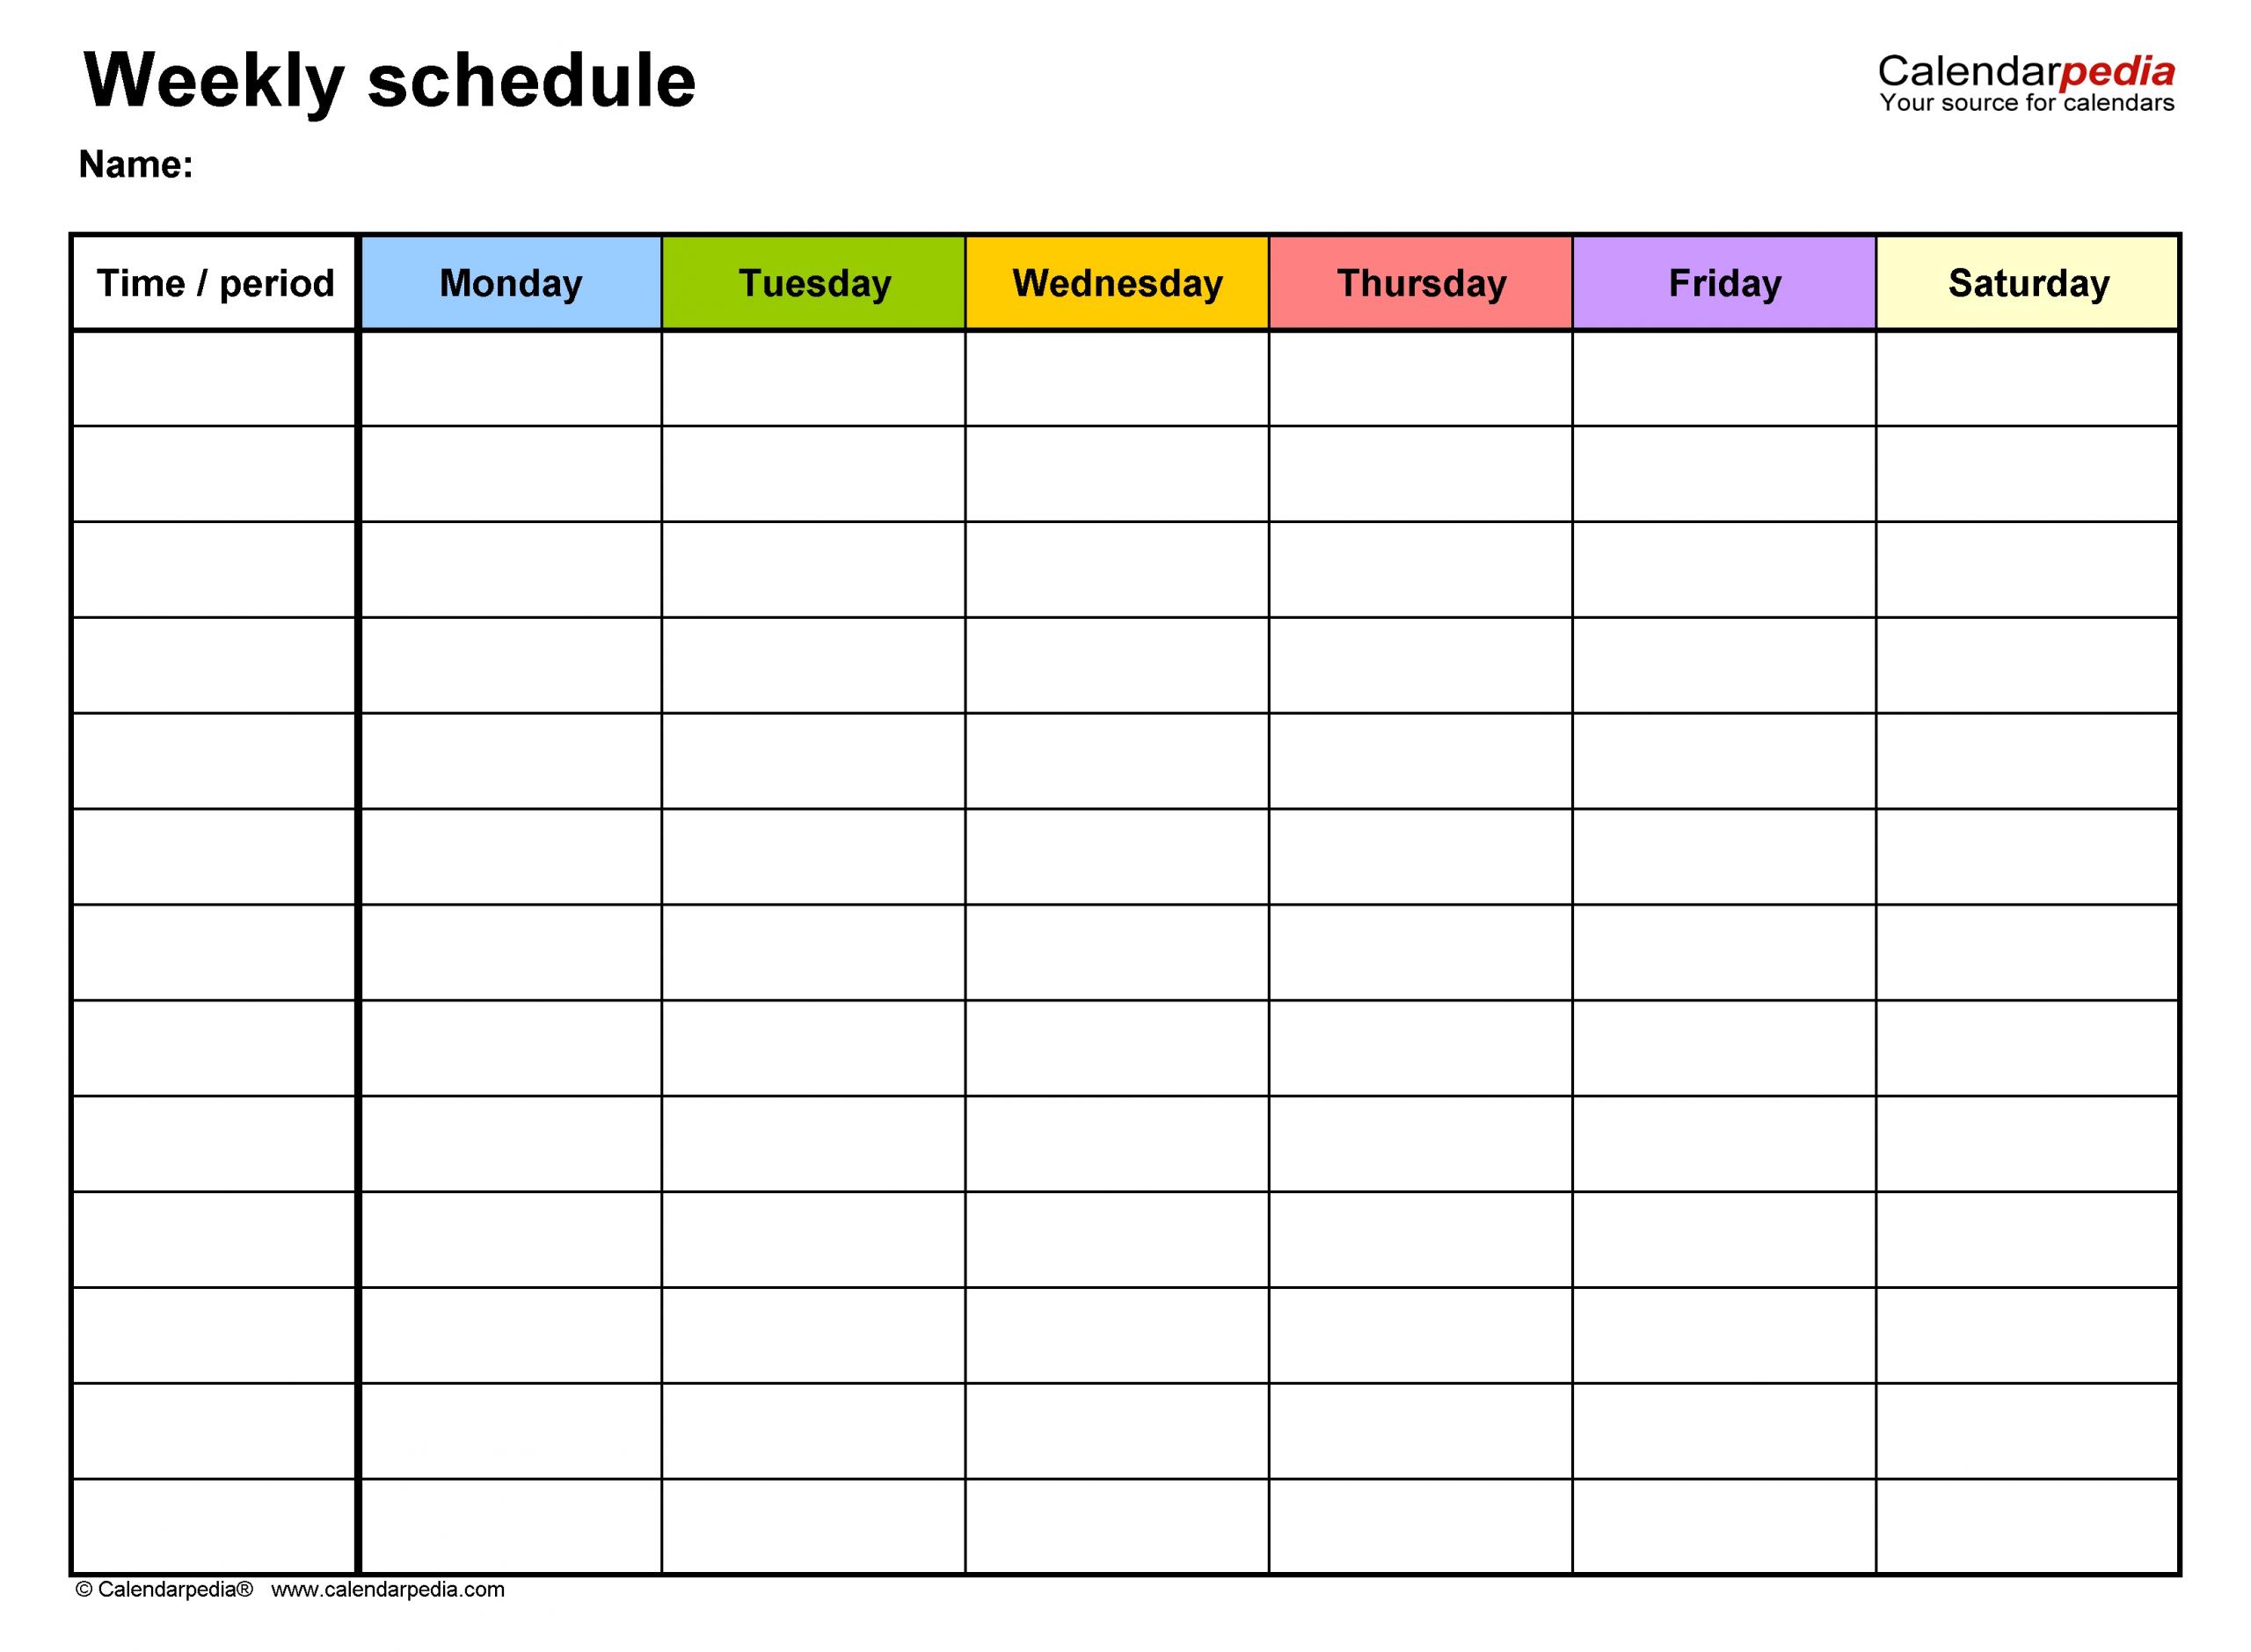 Create Your 5 Year Schedule Excel – Get Your Calendar Excel 5 Year Calendar